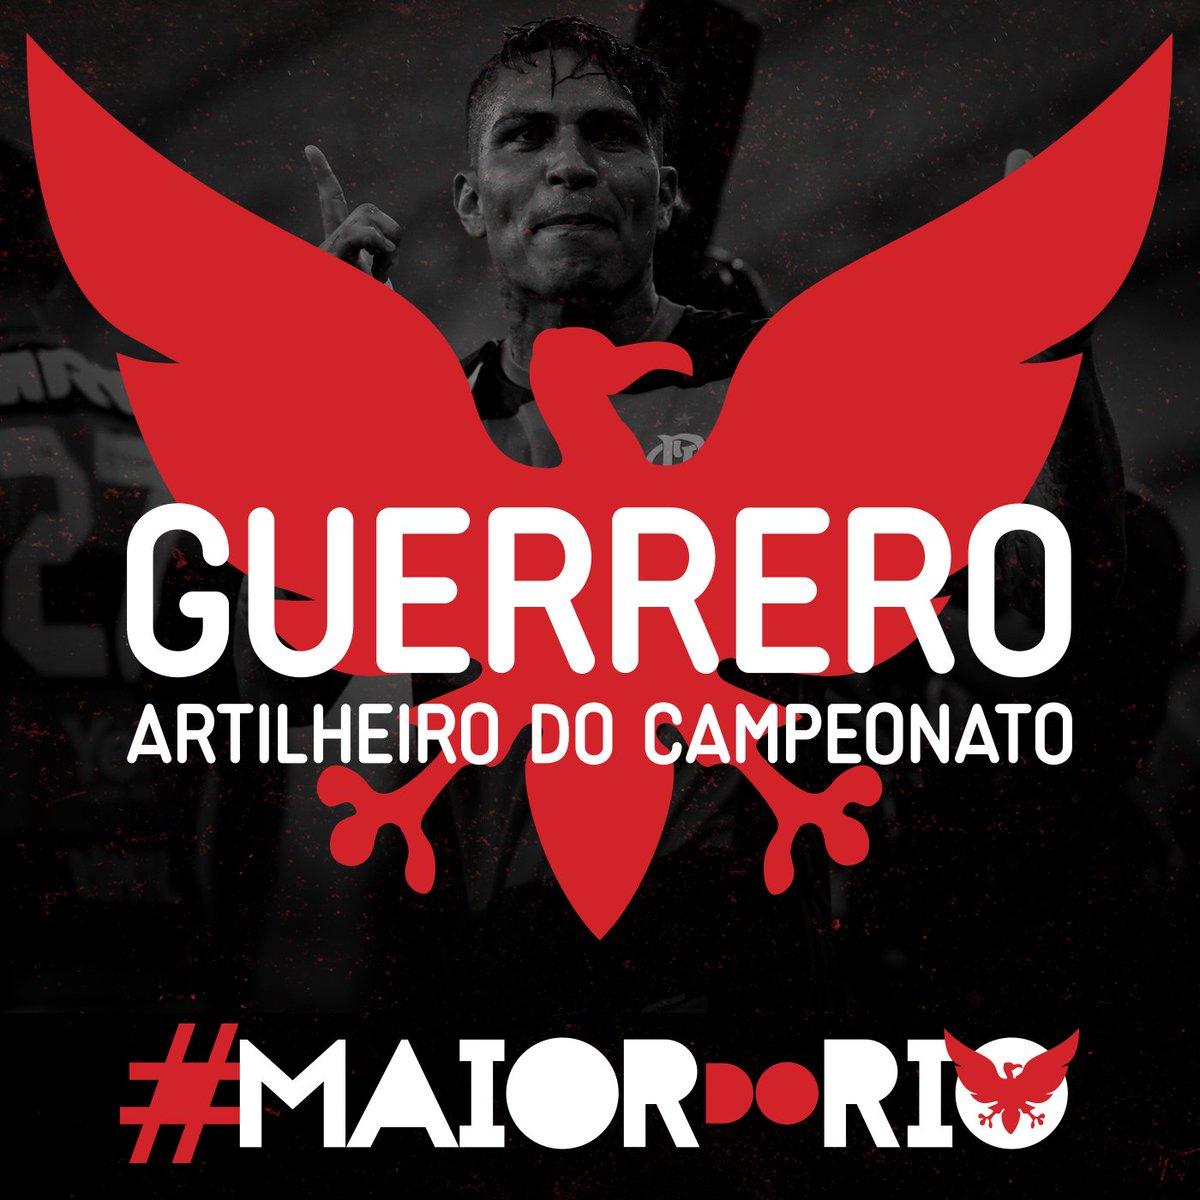 Acabou o caô, o artilheiro do campeonato chegou! Guerrero é o nome dele #MaiorDoRio